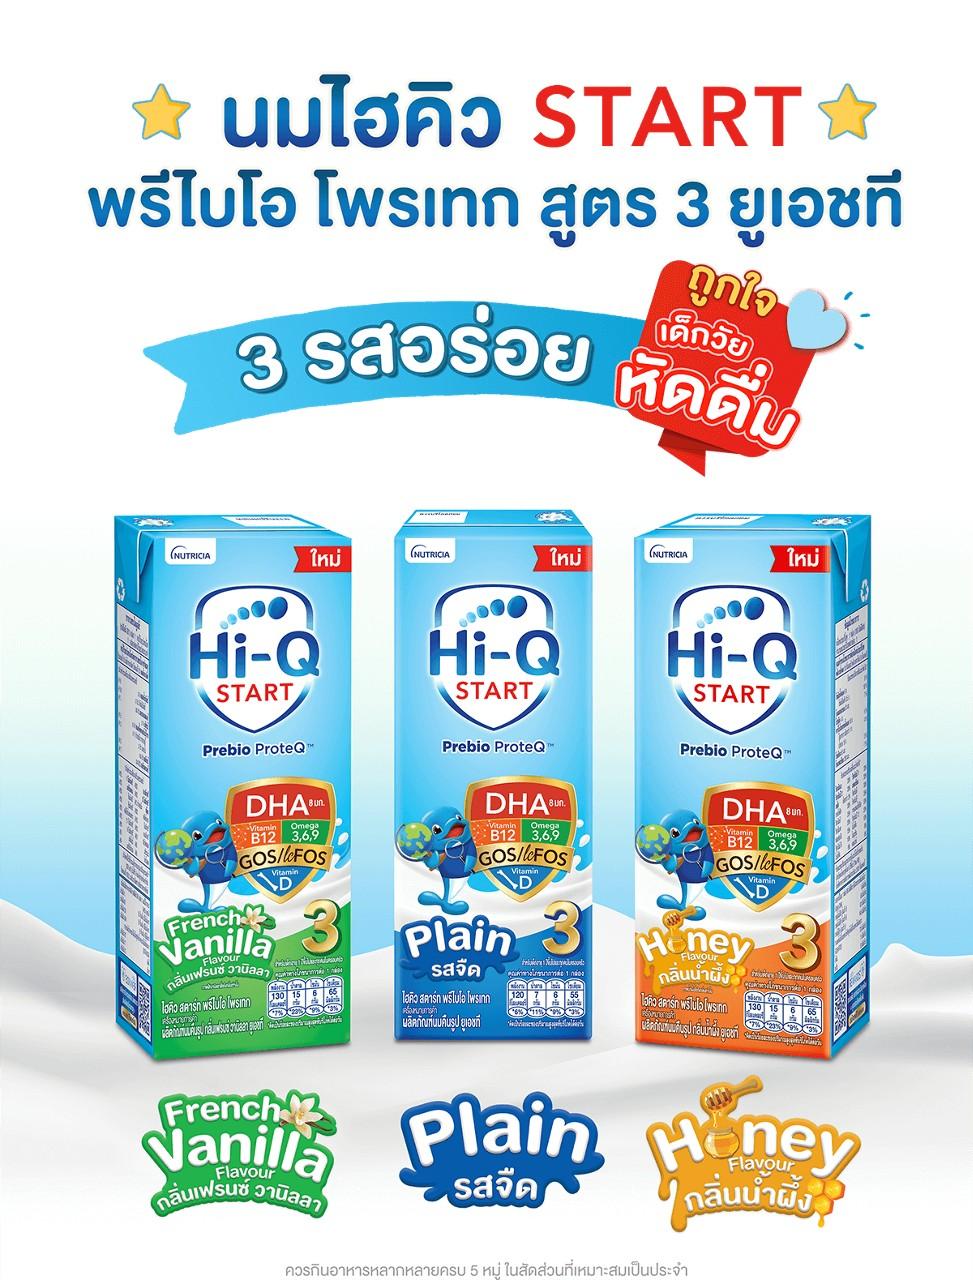 Hi-Q-UHT-stage-3-10-edit-03-draft5.png